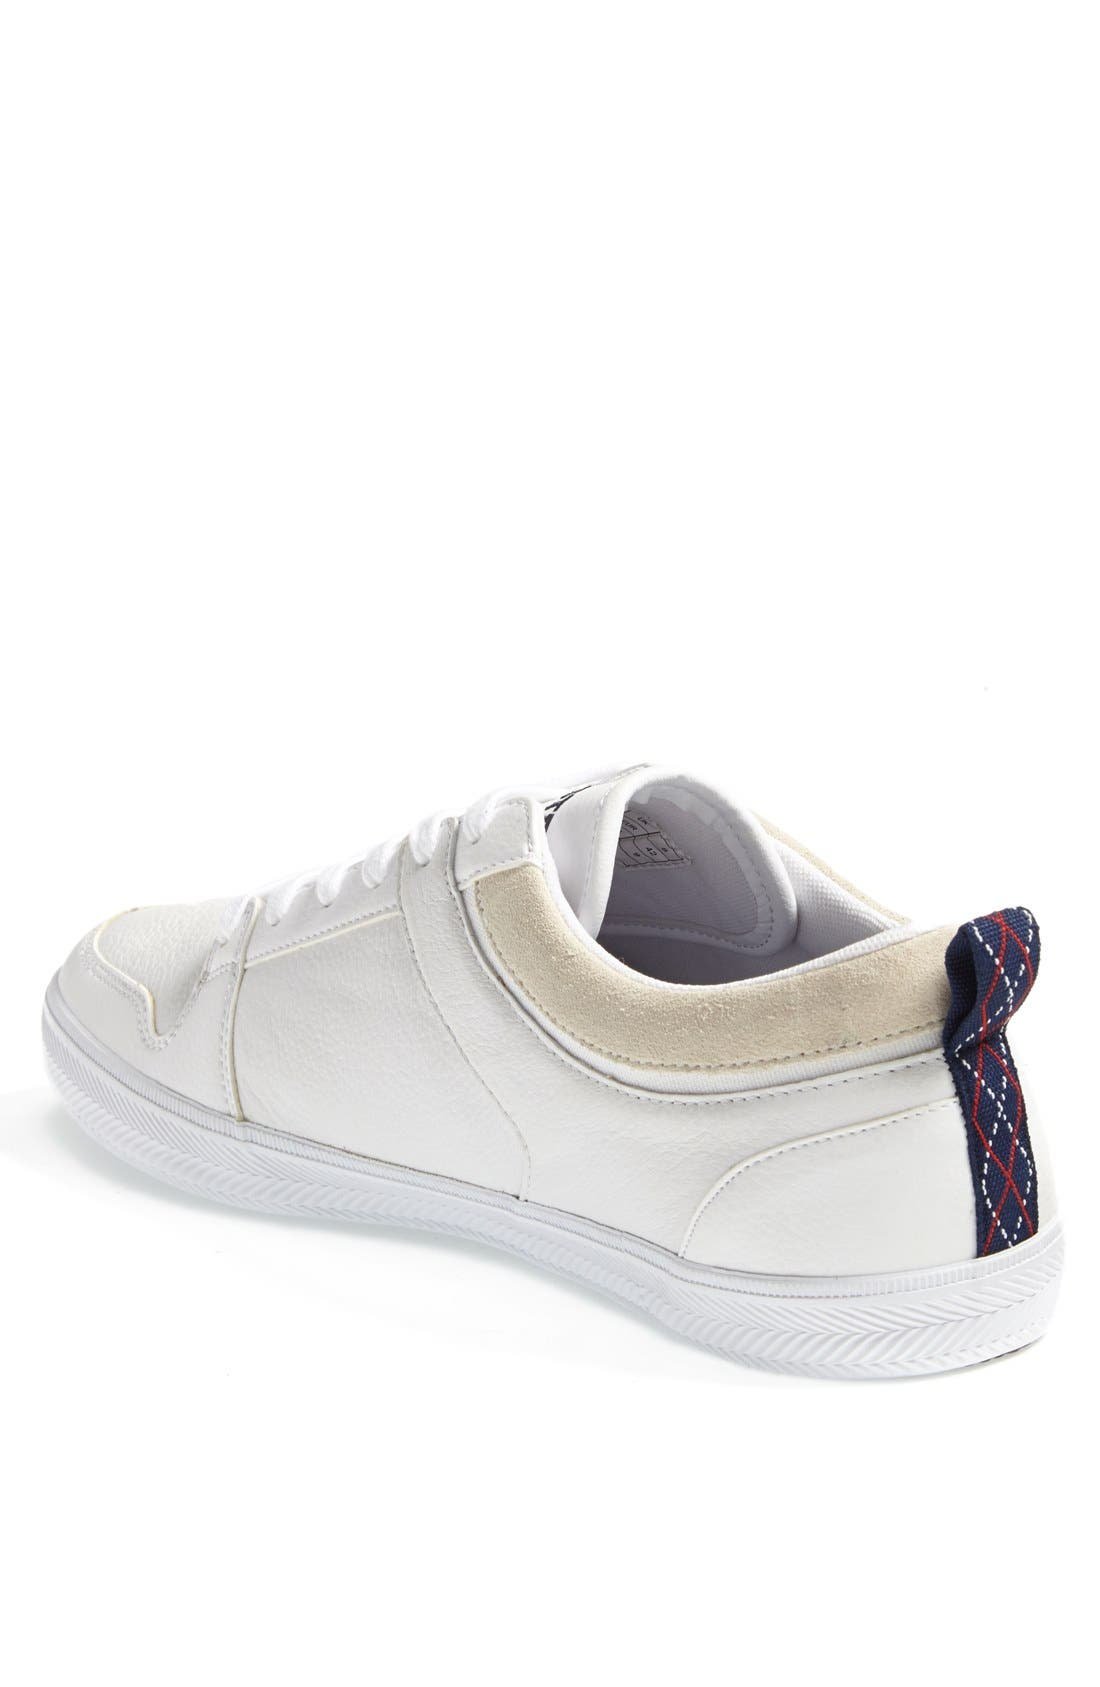 Alternate Image 2  - Lacoste 'Ojetti Mag' Sneaker (Men)